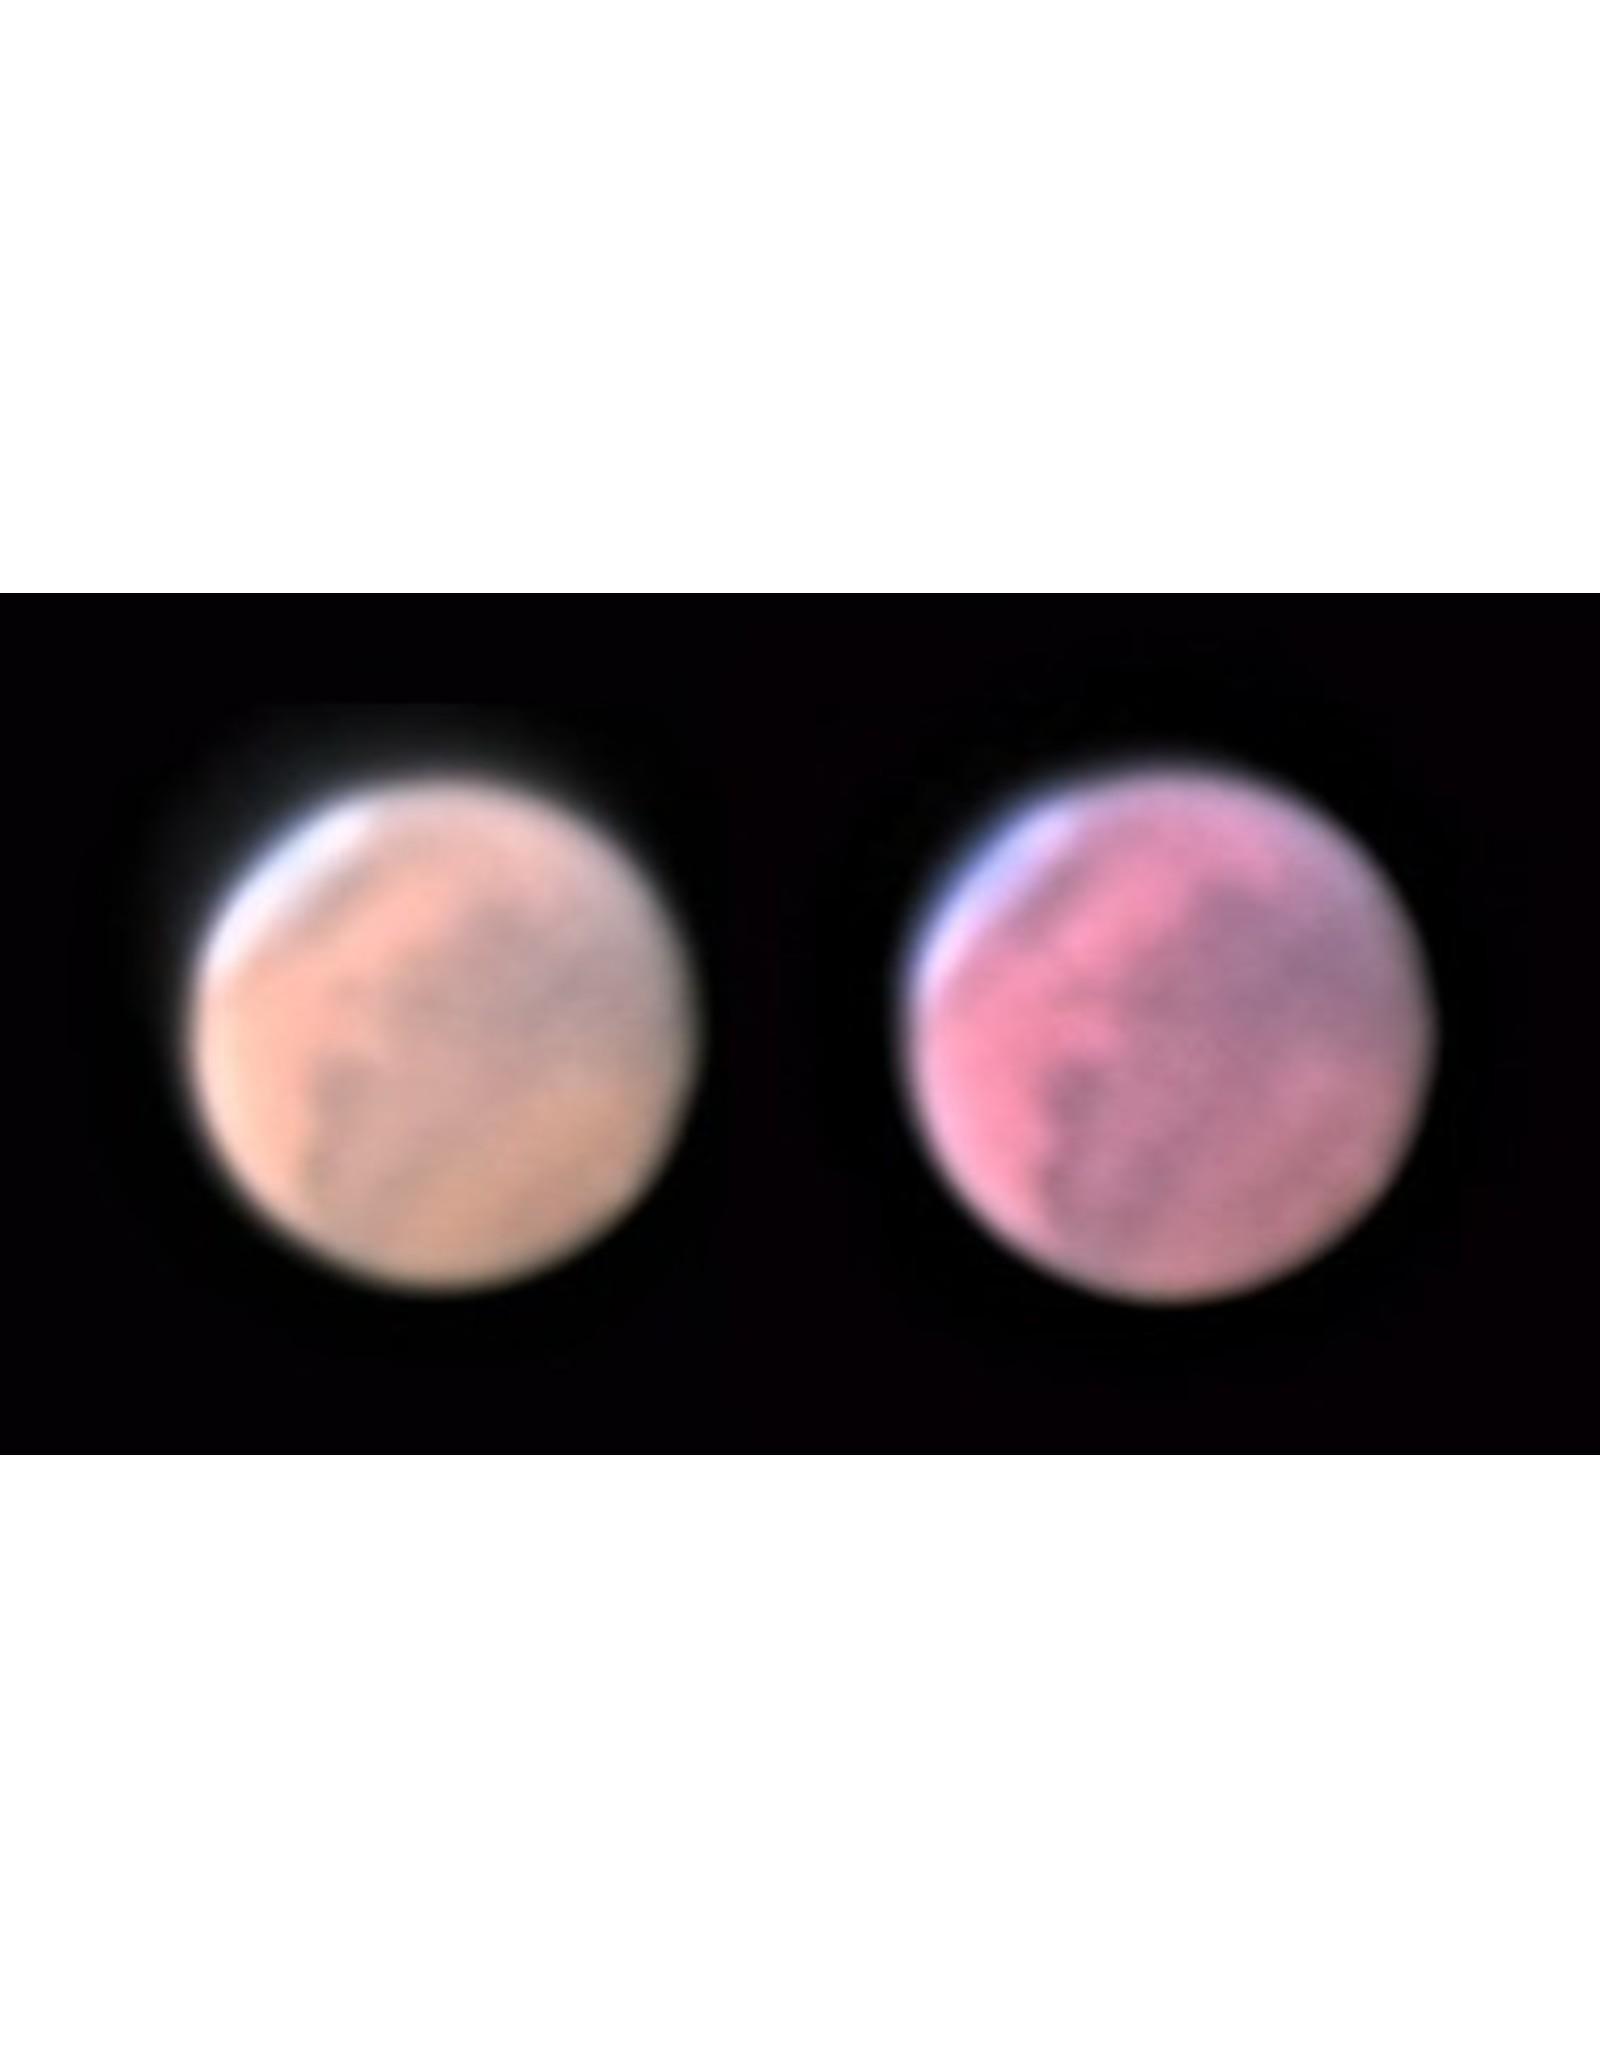 Baader Planetarium Baader Planetarium Moon & Skyglow Planetary Contrast (Neodymium) filter